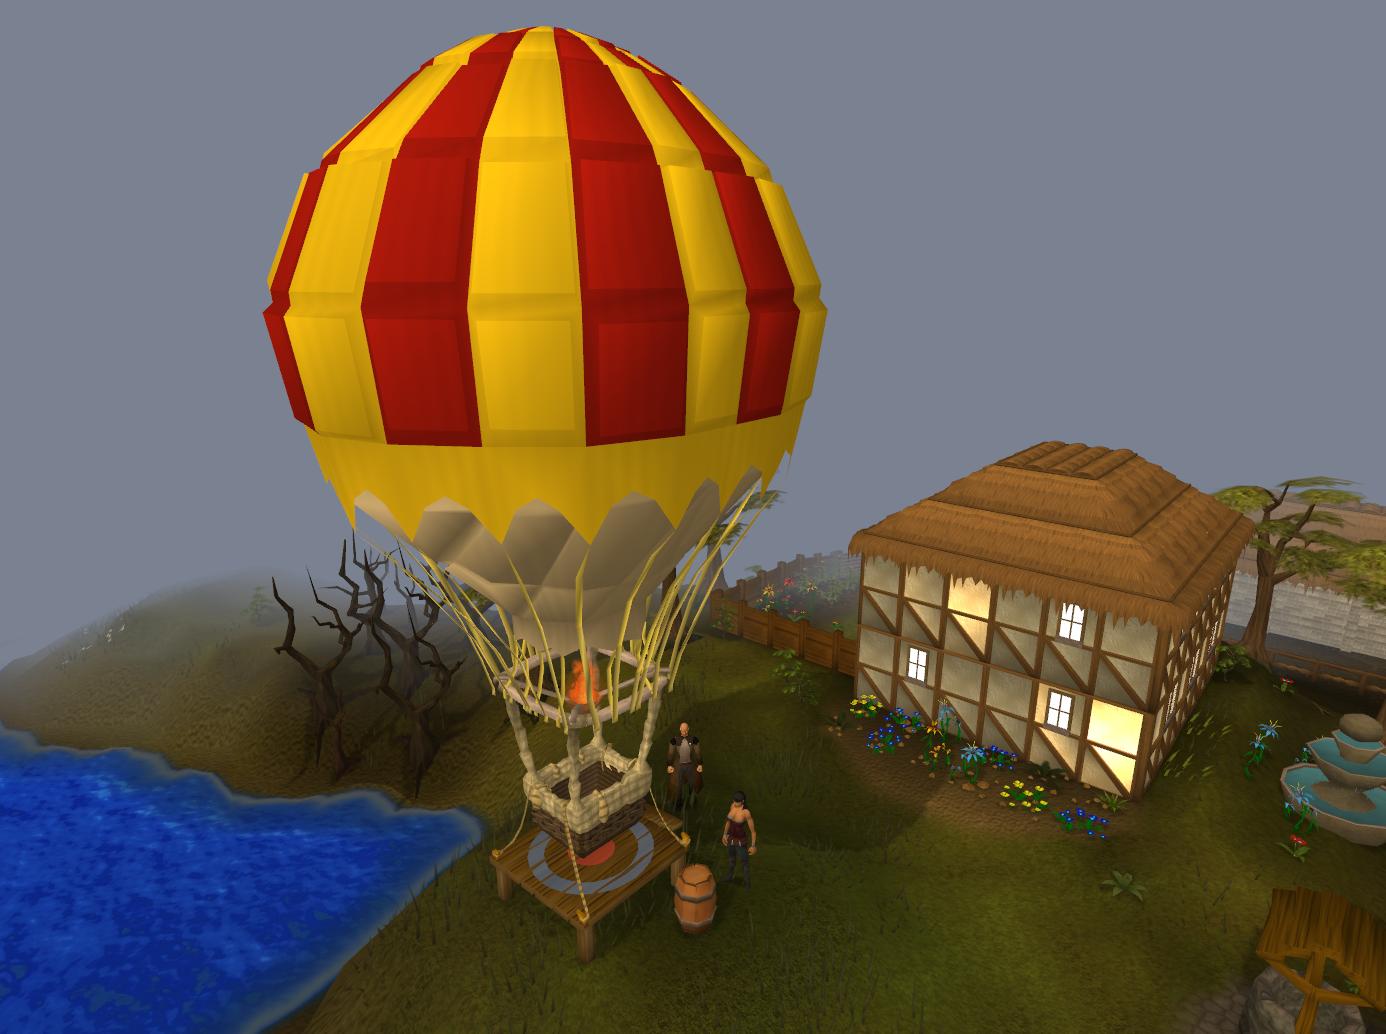 Balloon transport system | RuneScape Wiki | FANDOM powered